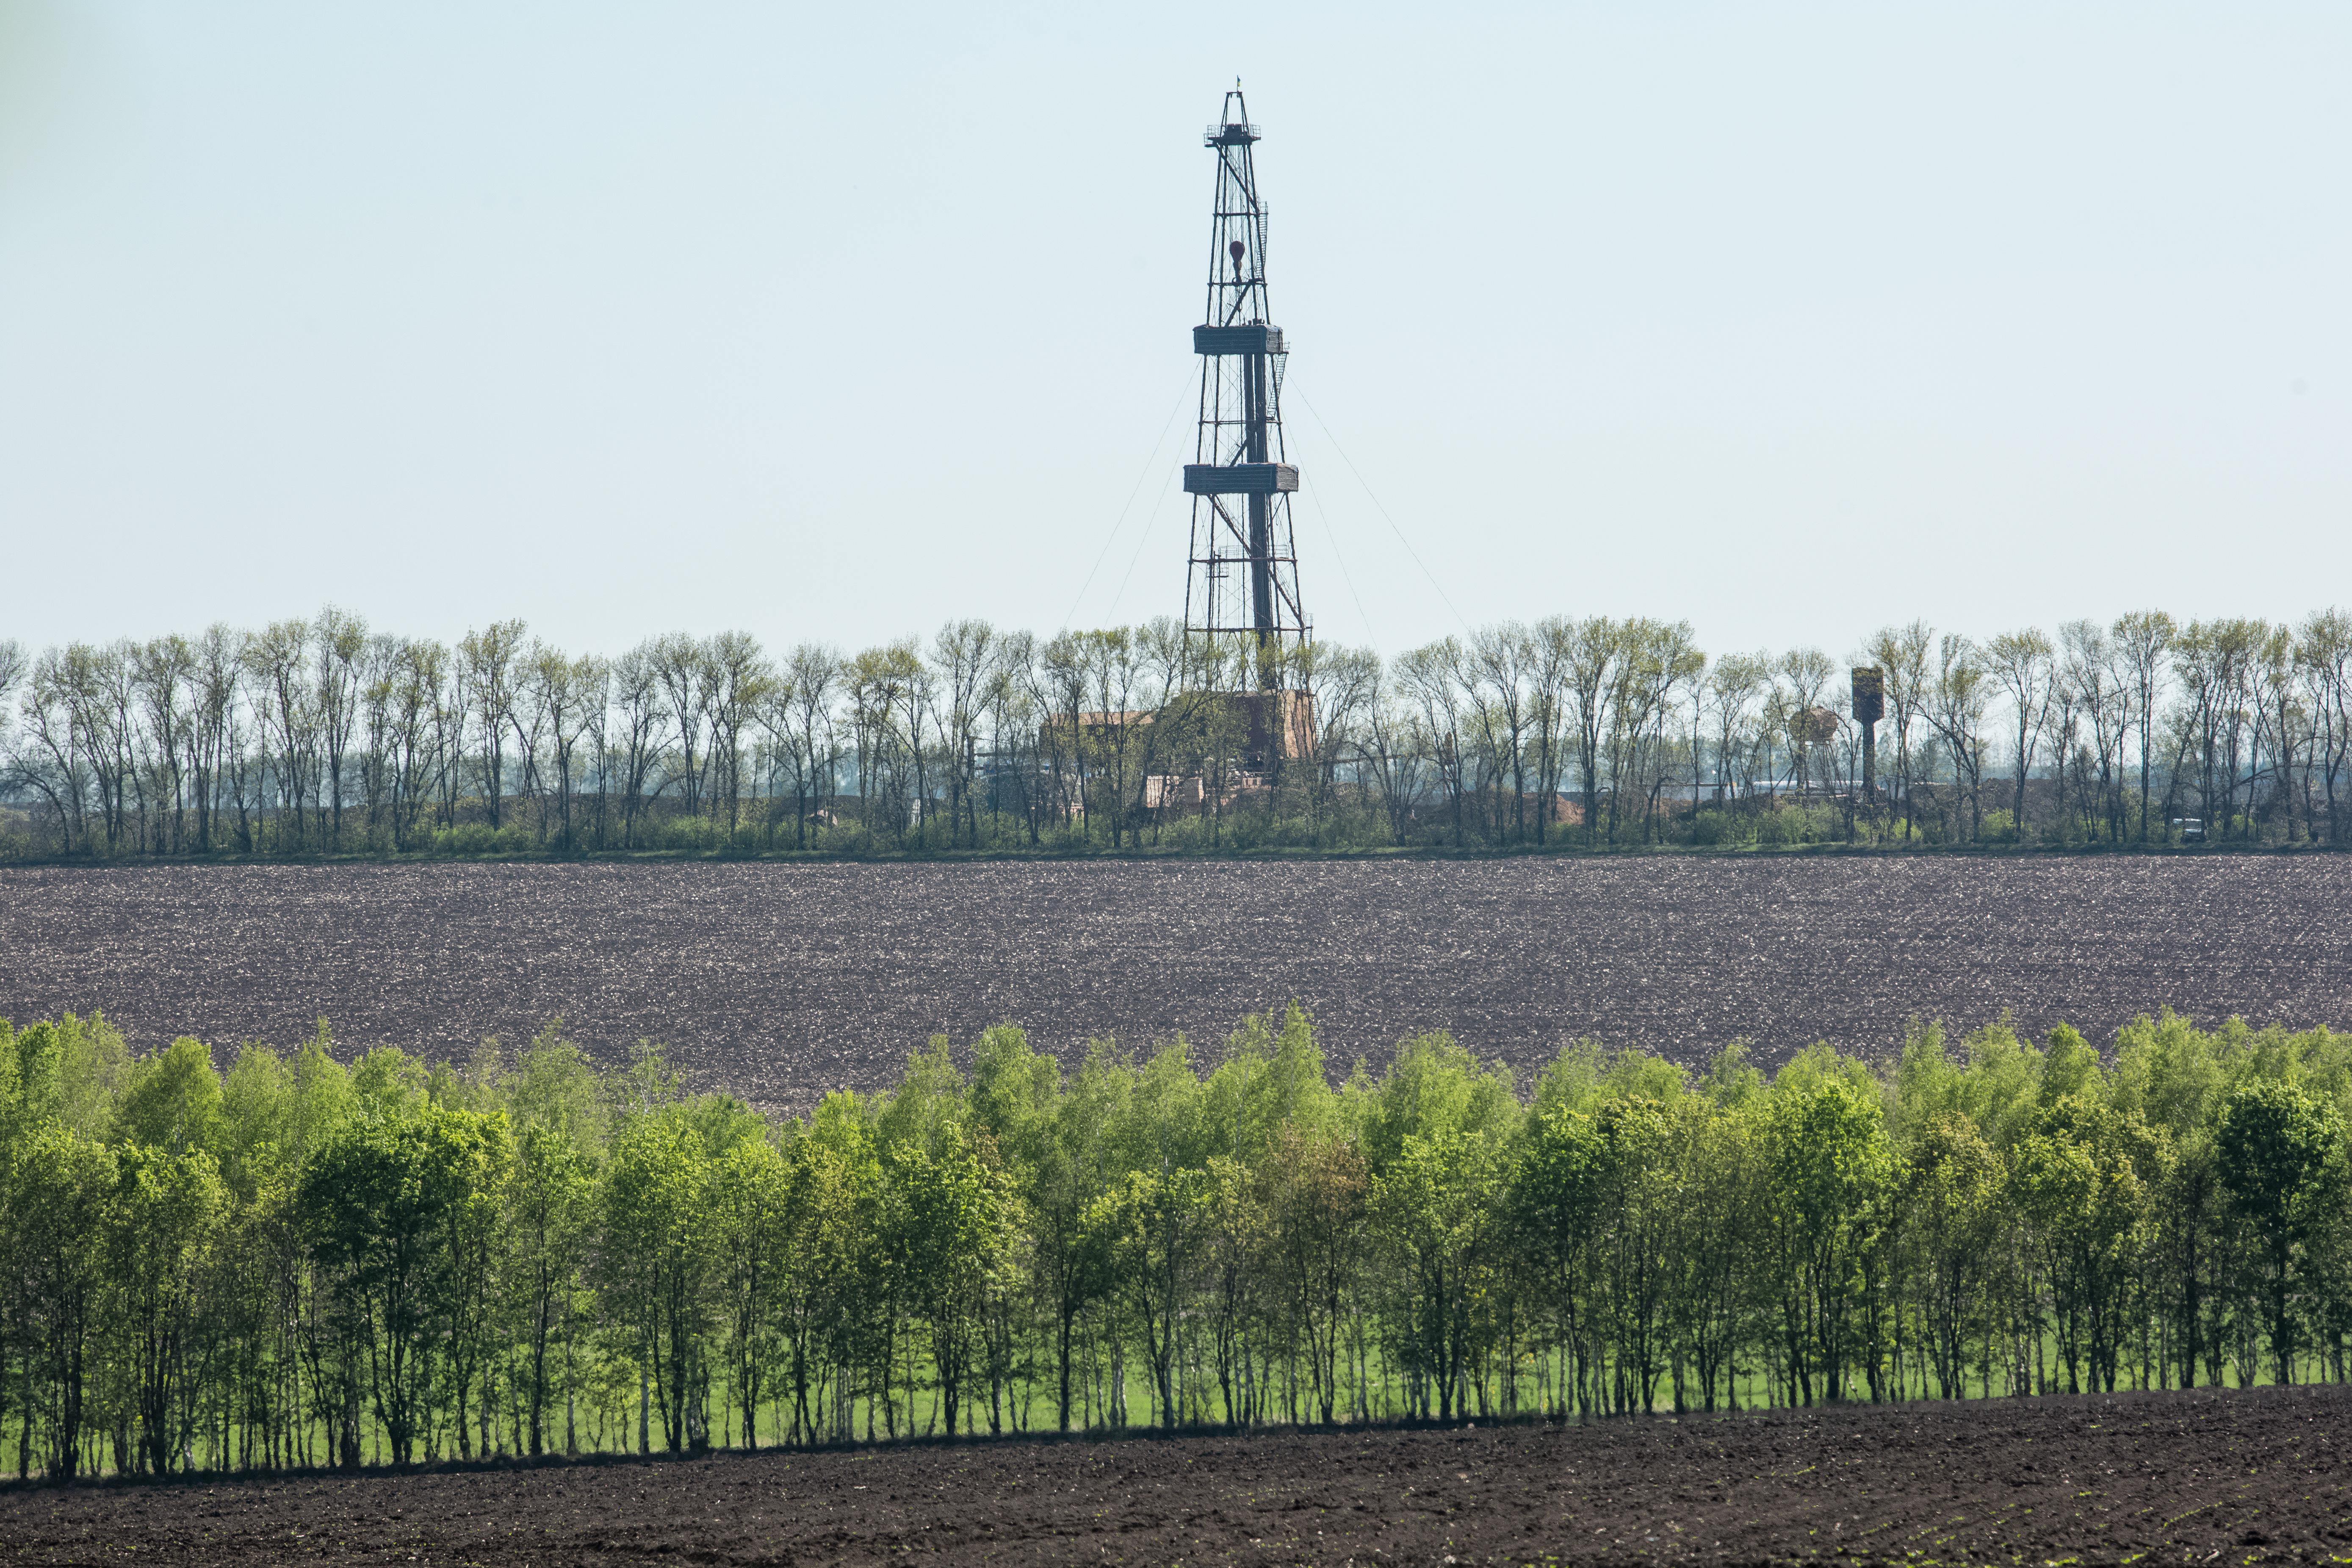 JSC UkrGasVydobuvannya discovered new deposit in Kharkiv region